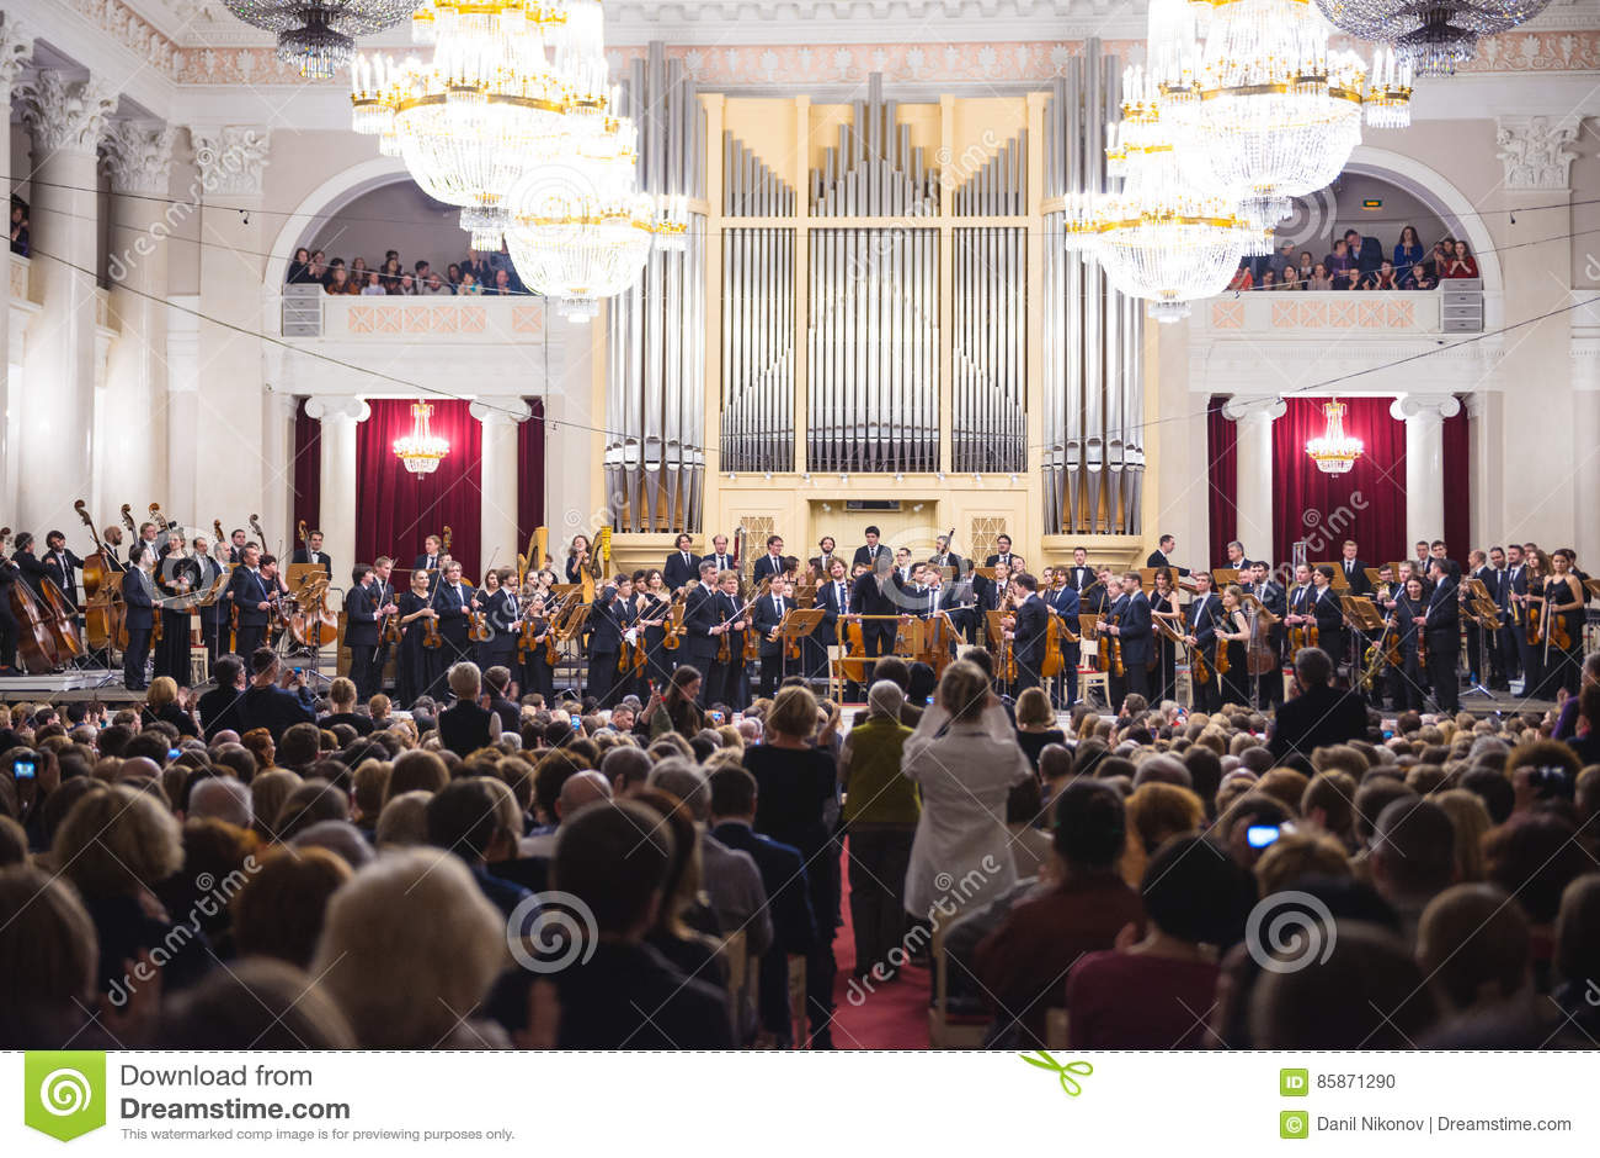 Classical music concert.